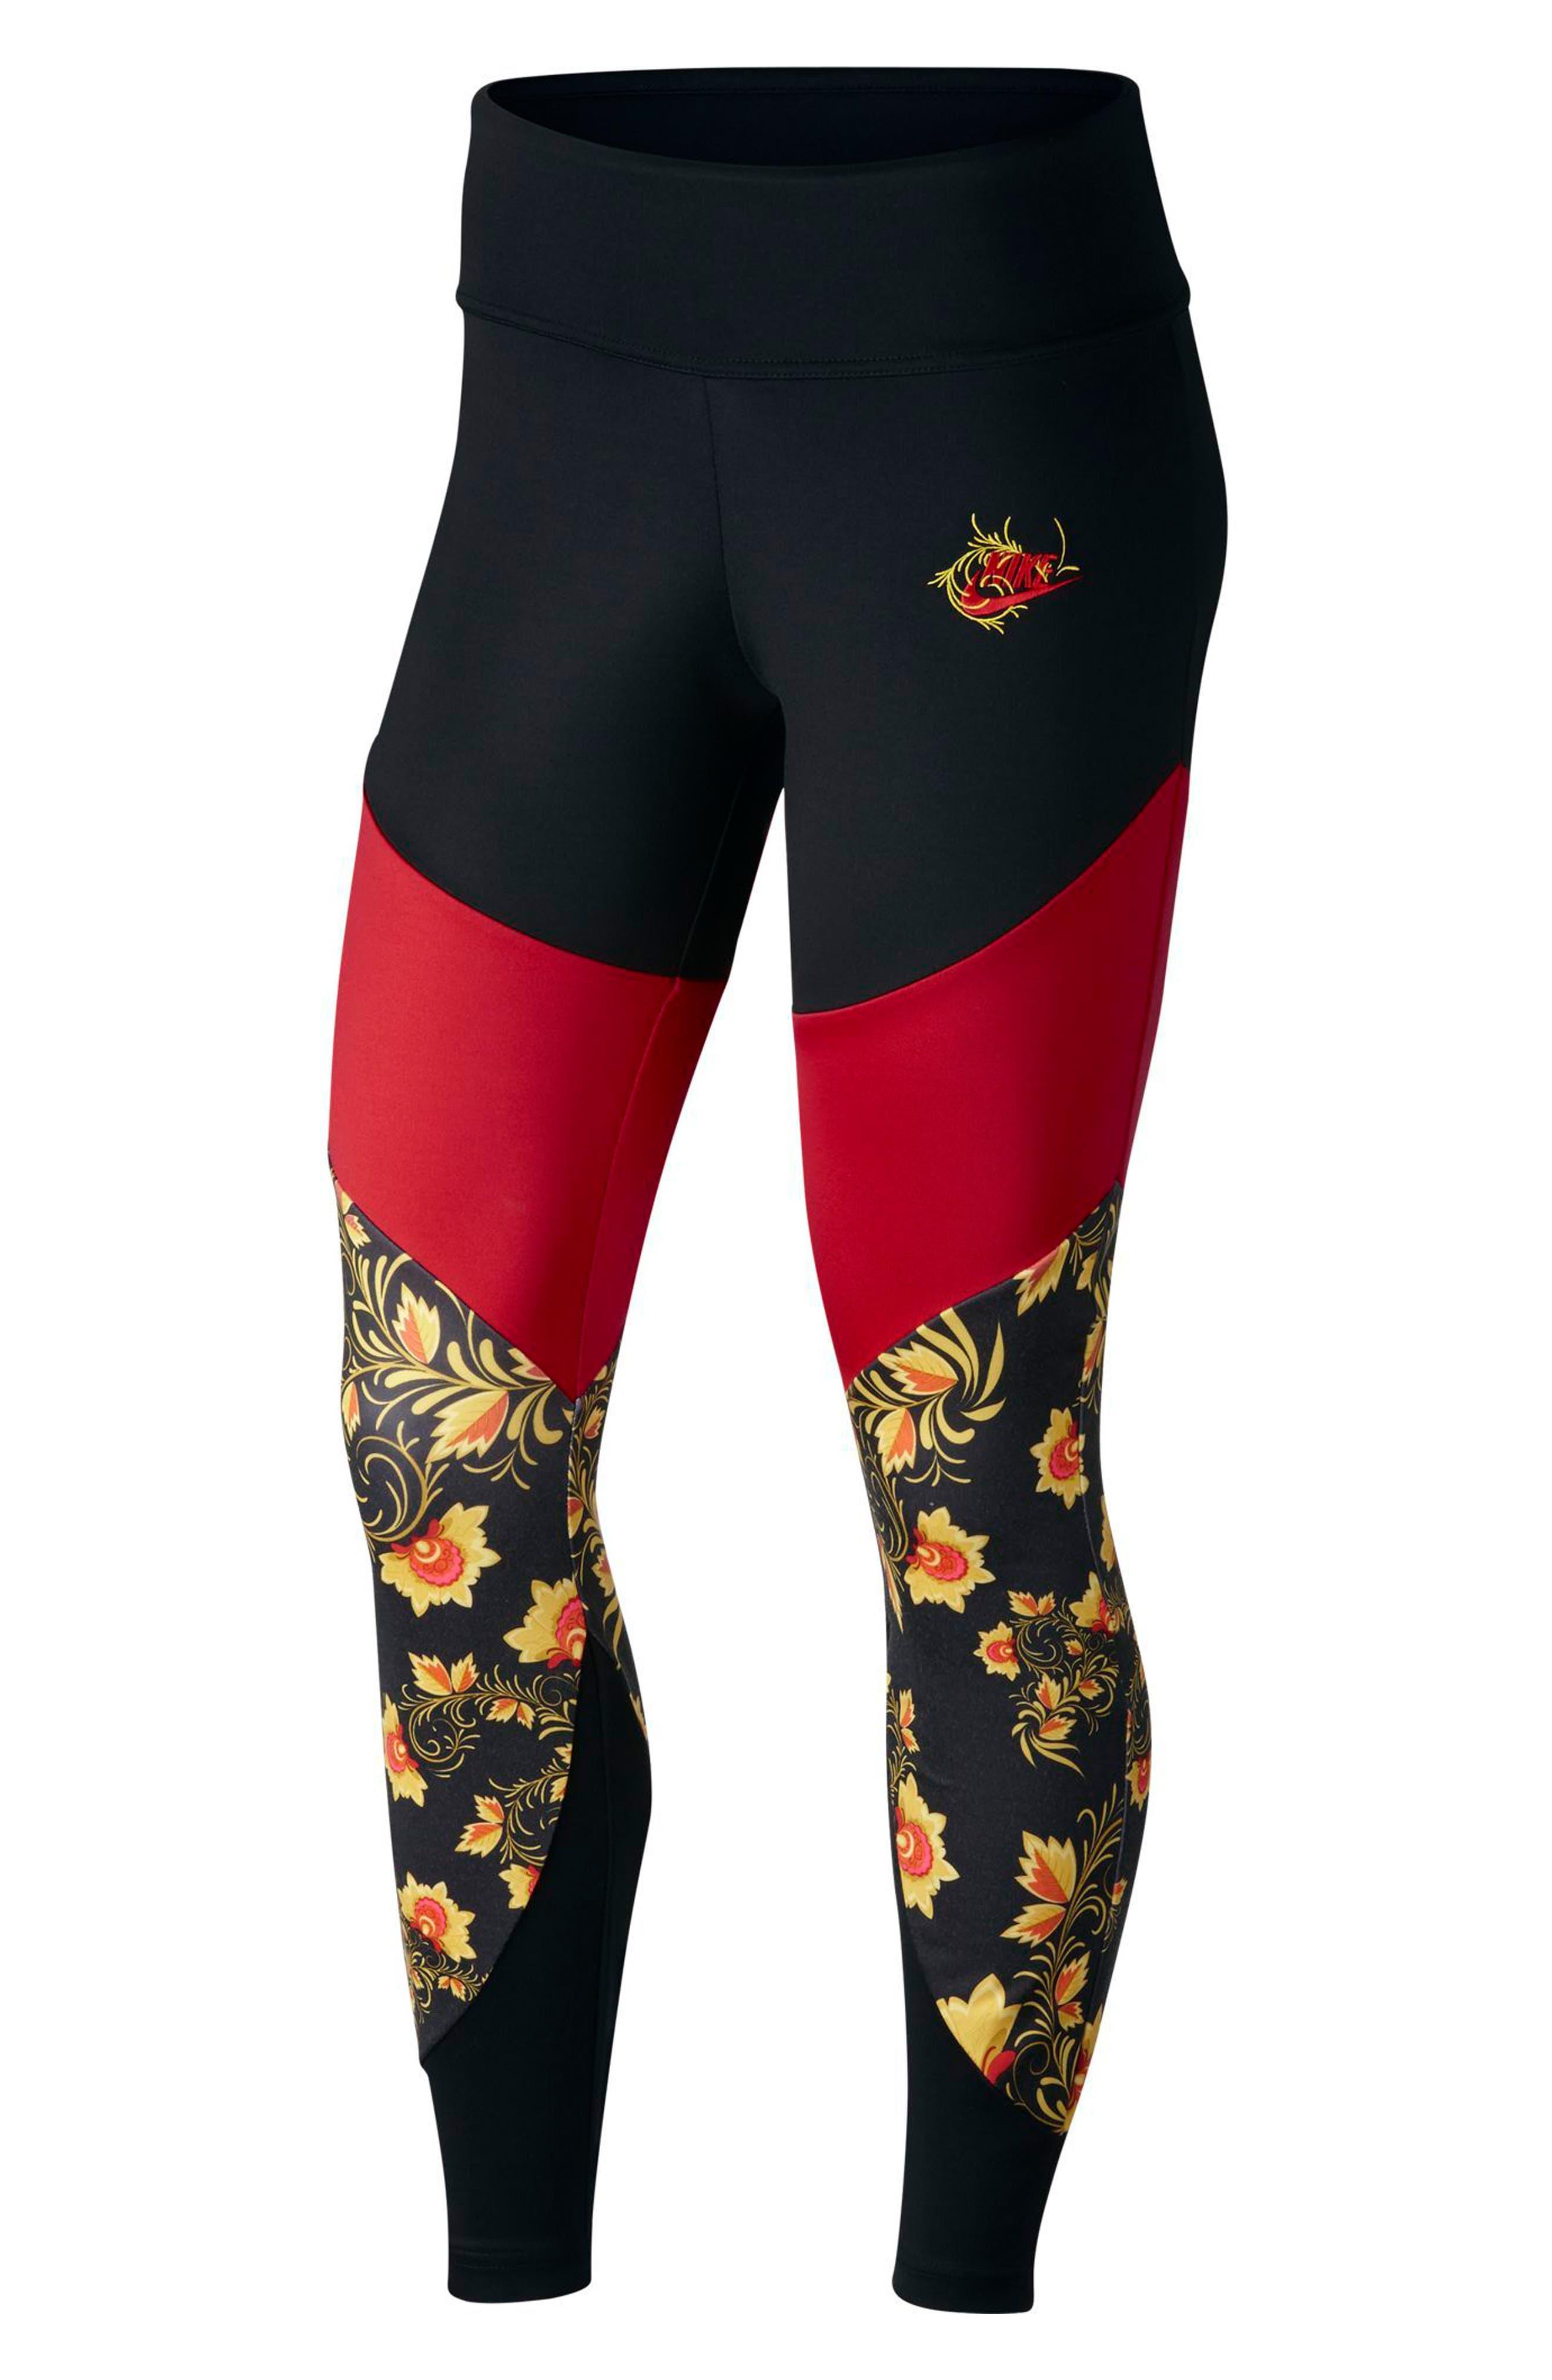 Sportswear Essential Colorblock Floral Women's Leggings,                             Main thumbnail 1, color,                             010